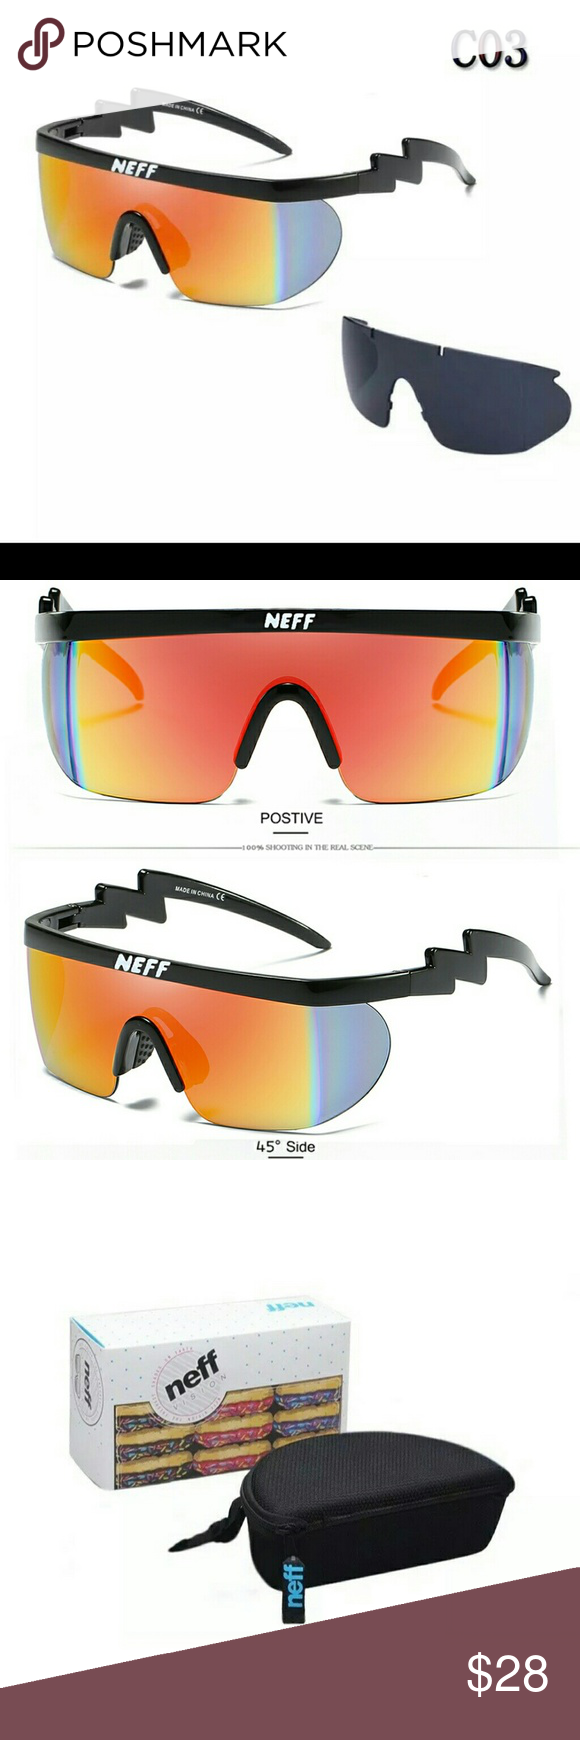 2e04accde2f7f Neff Brodie  Riff Raff  UV 400 Sunglasses C03 Neff Brodie  Riff Raff ...